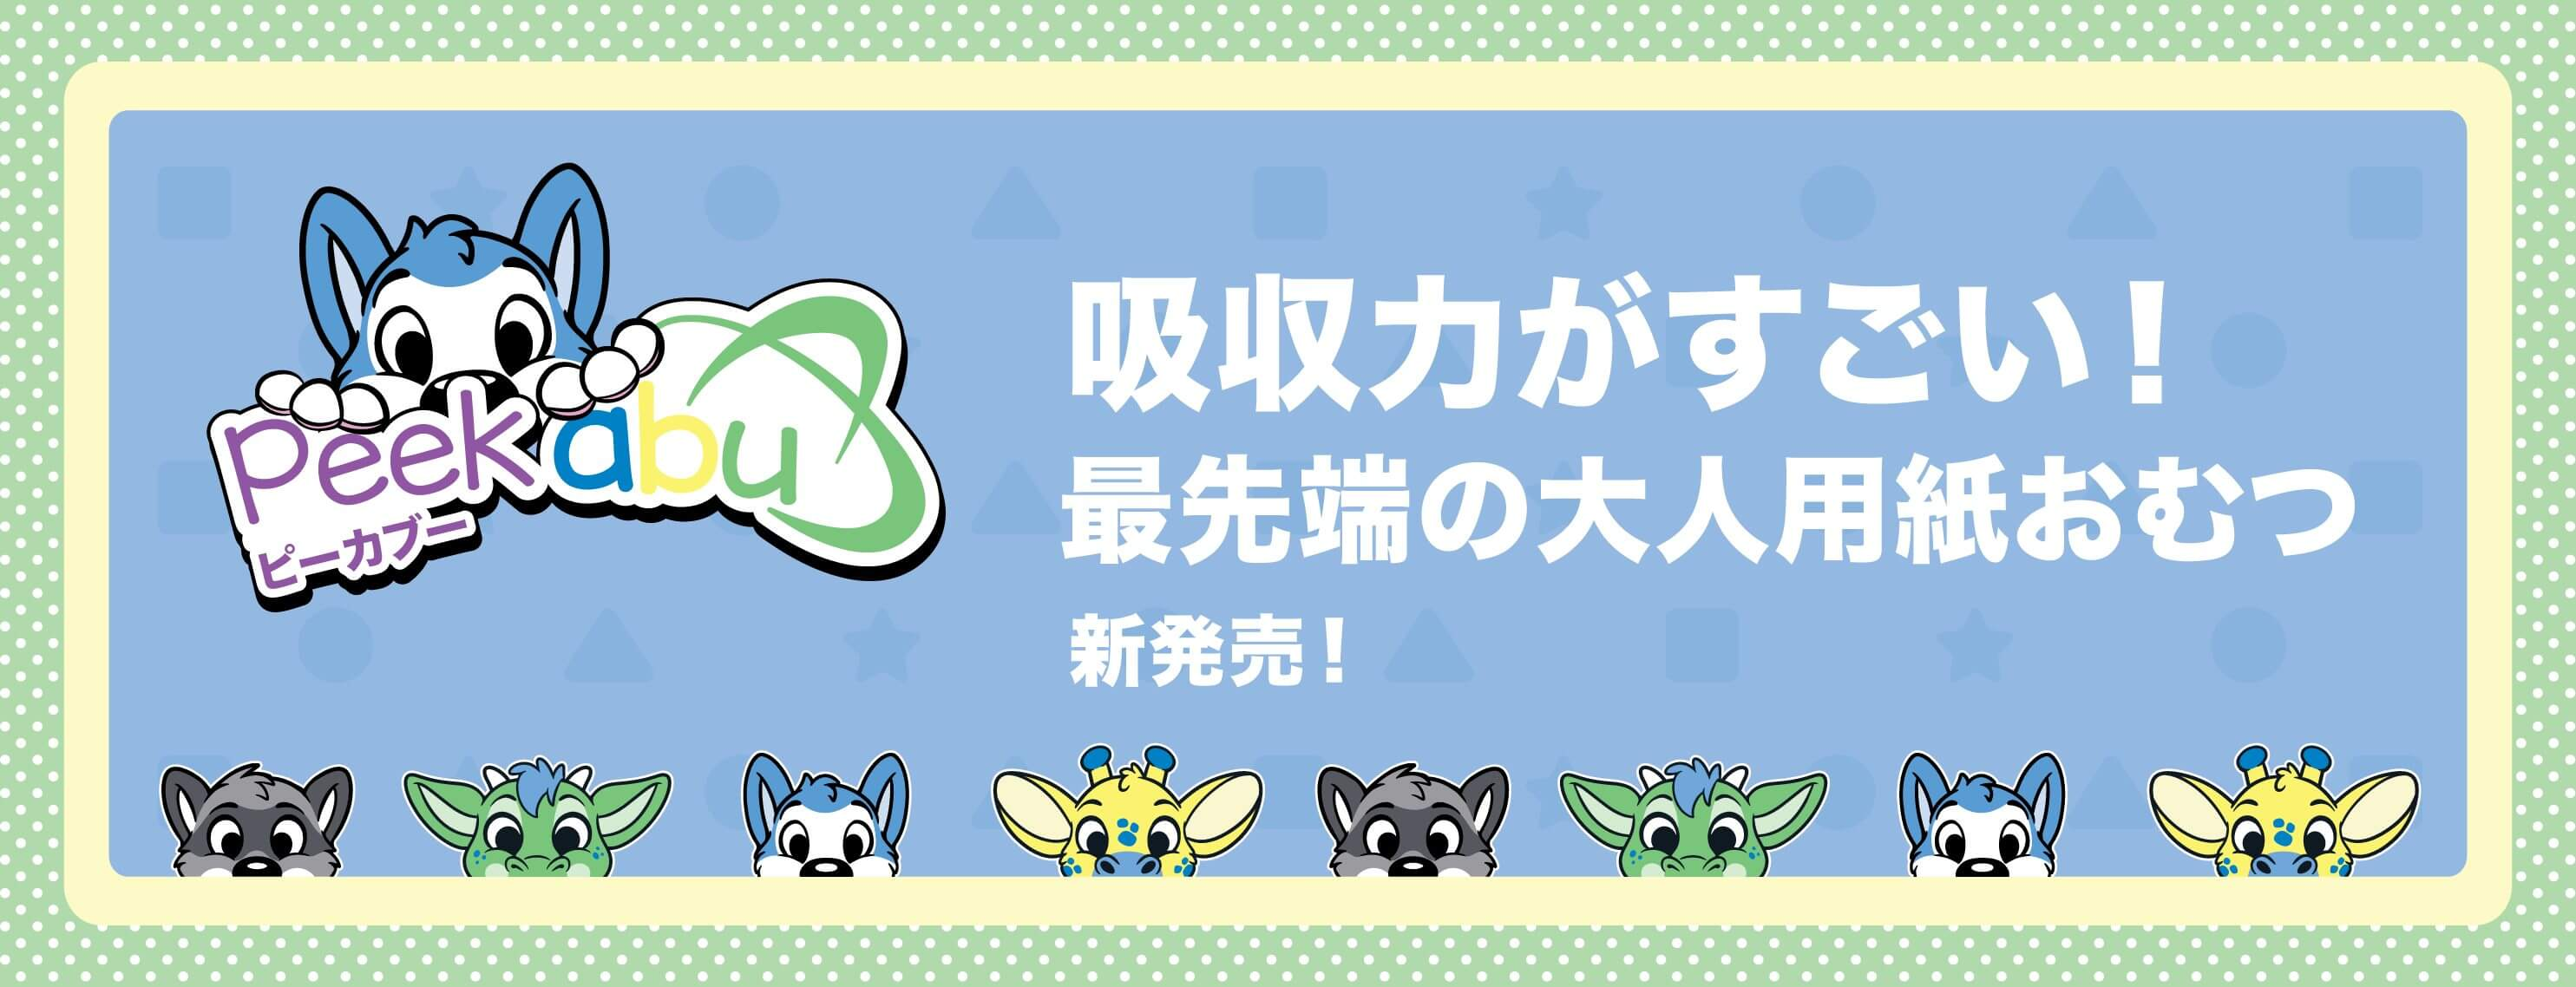 PeekABU Release Banner